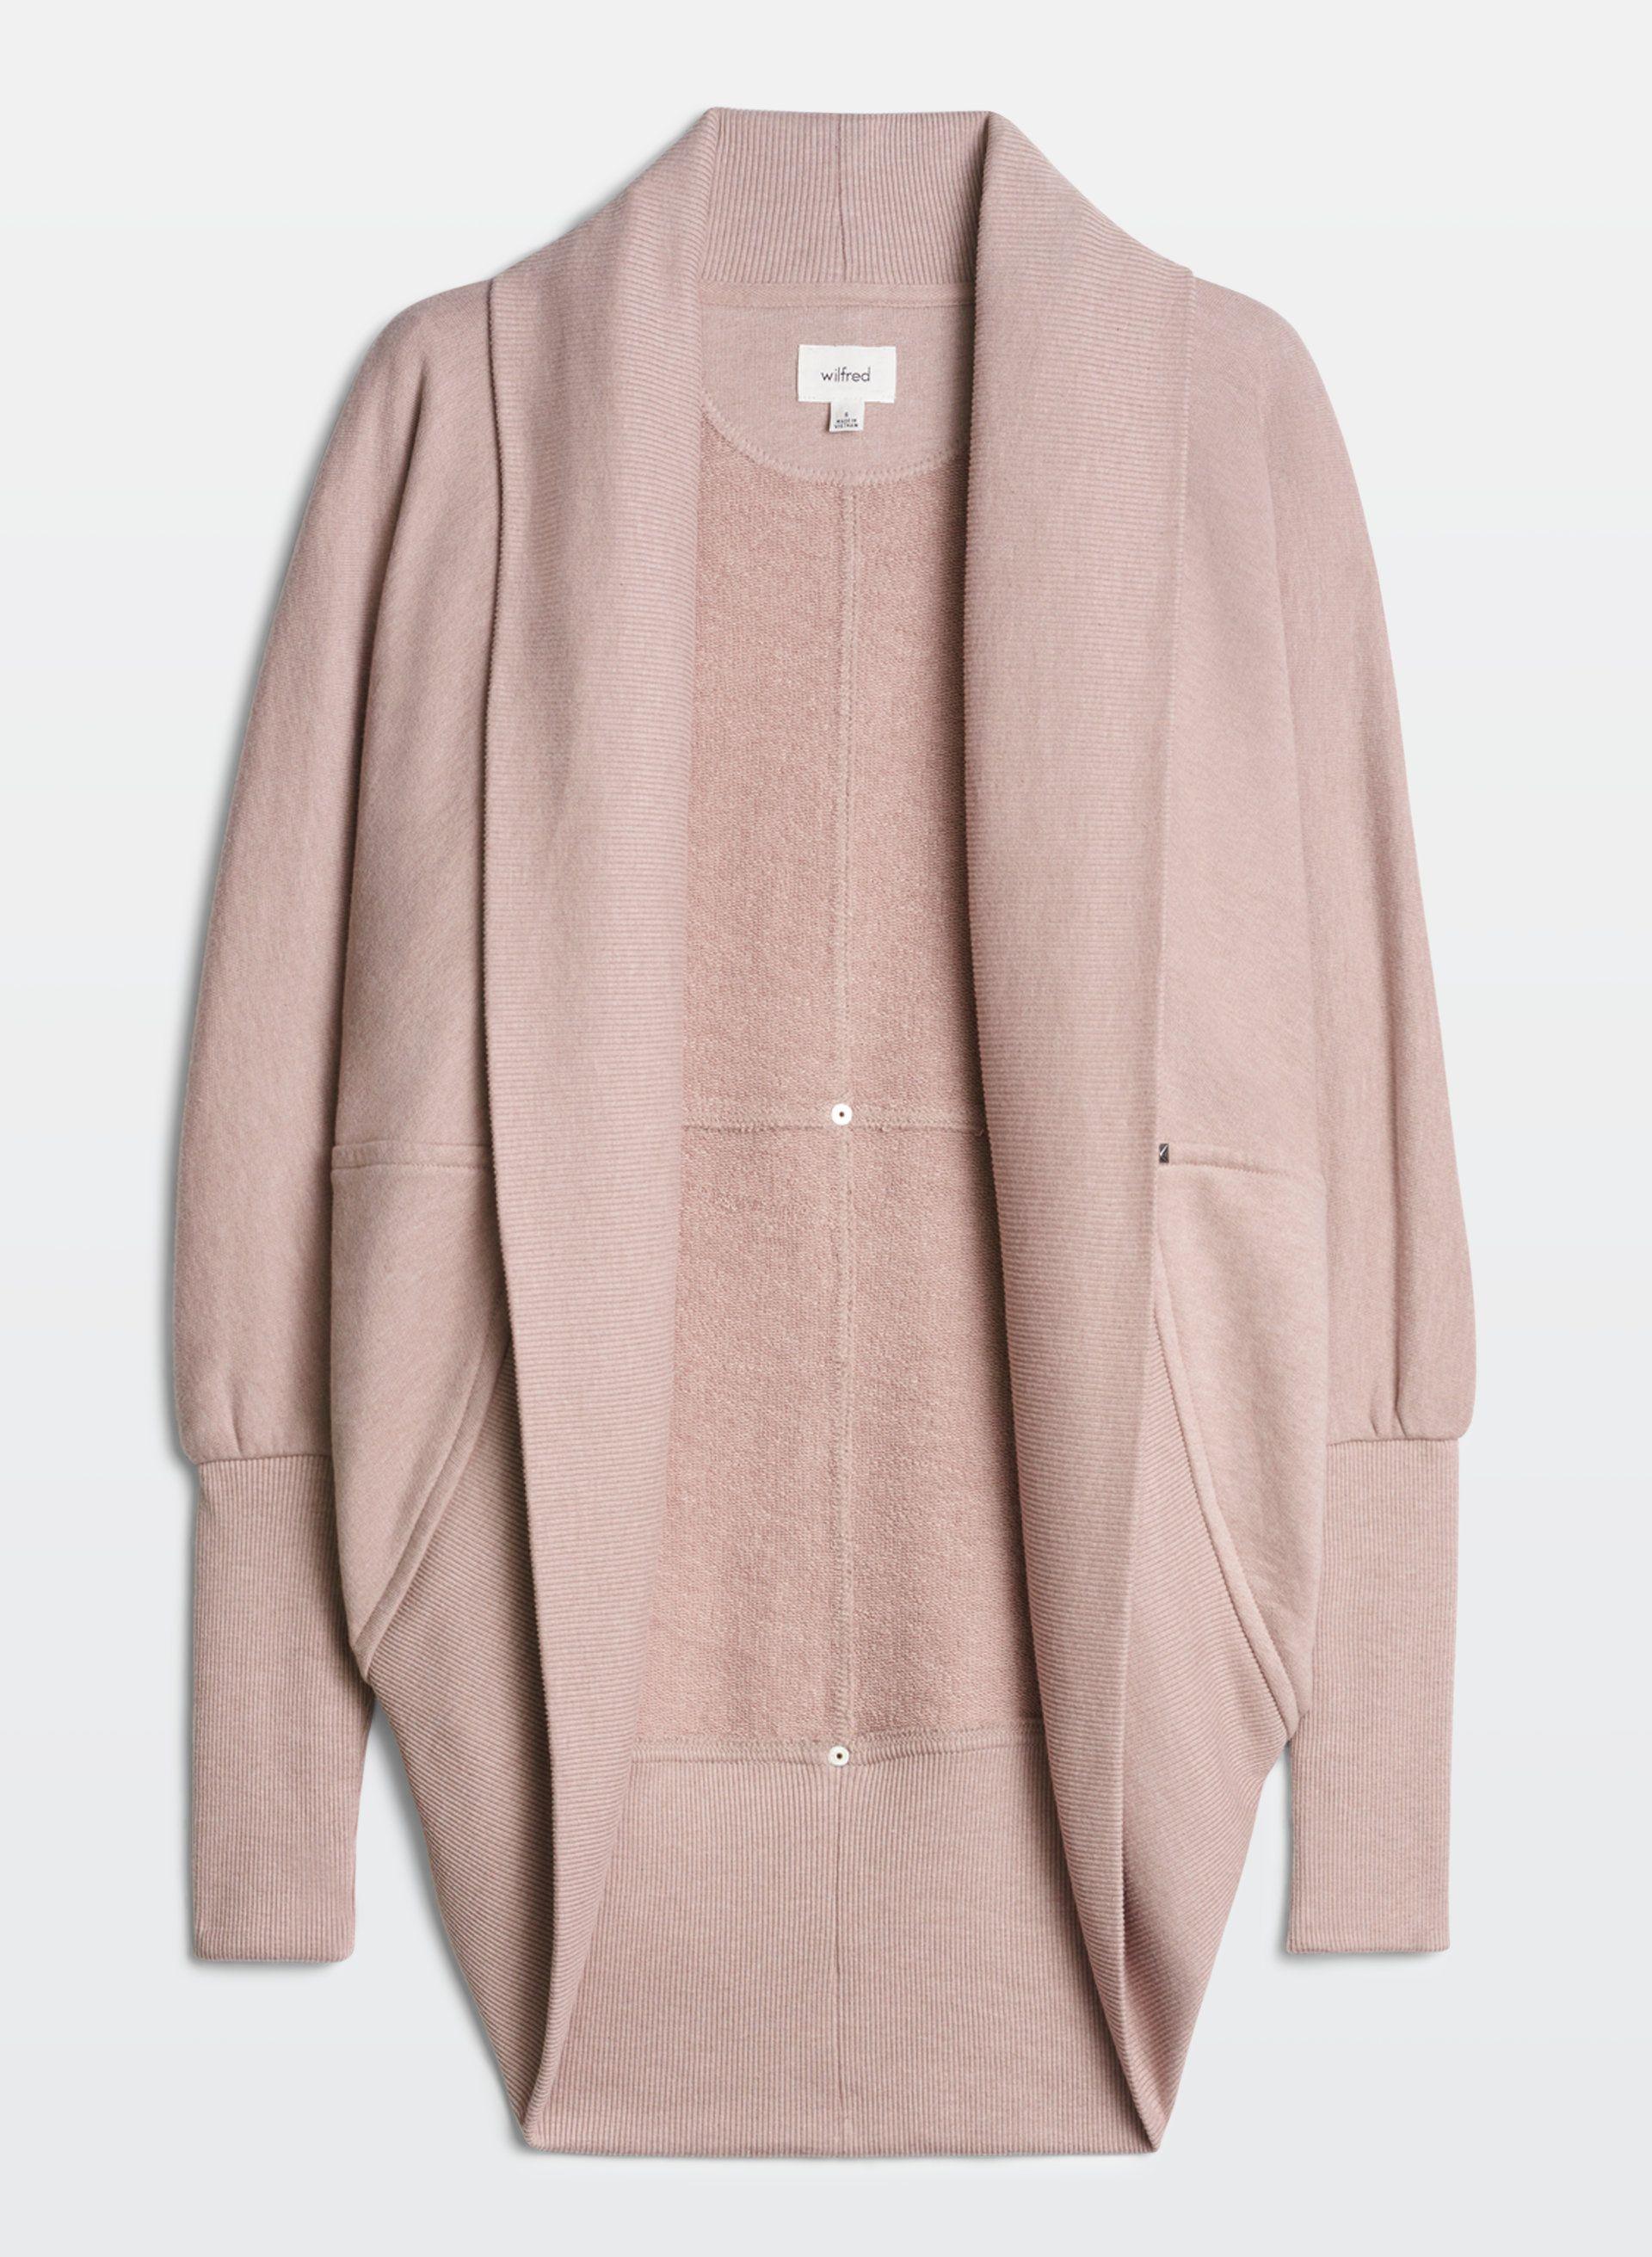 b4ffbd24815ae Wilfred Diderot Sweater from Aritzia